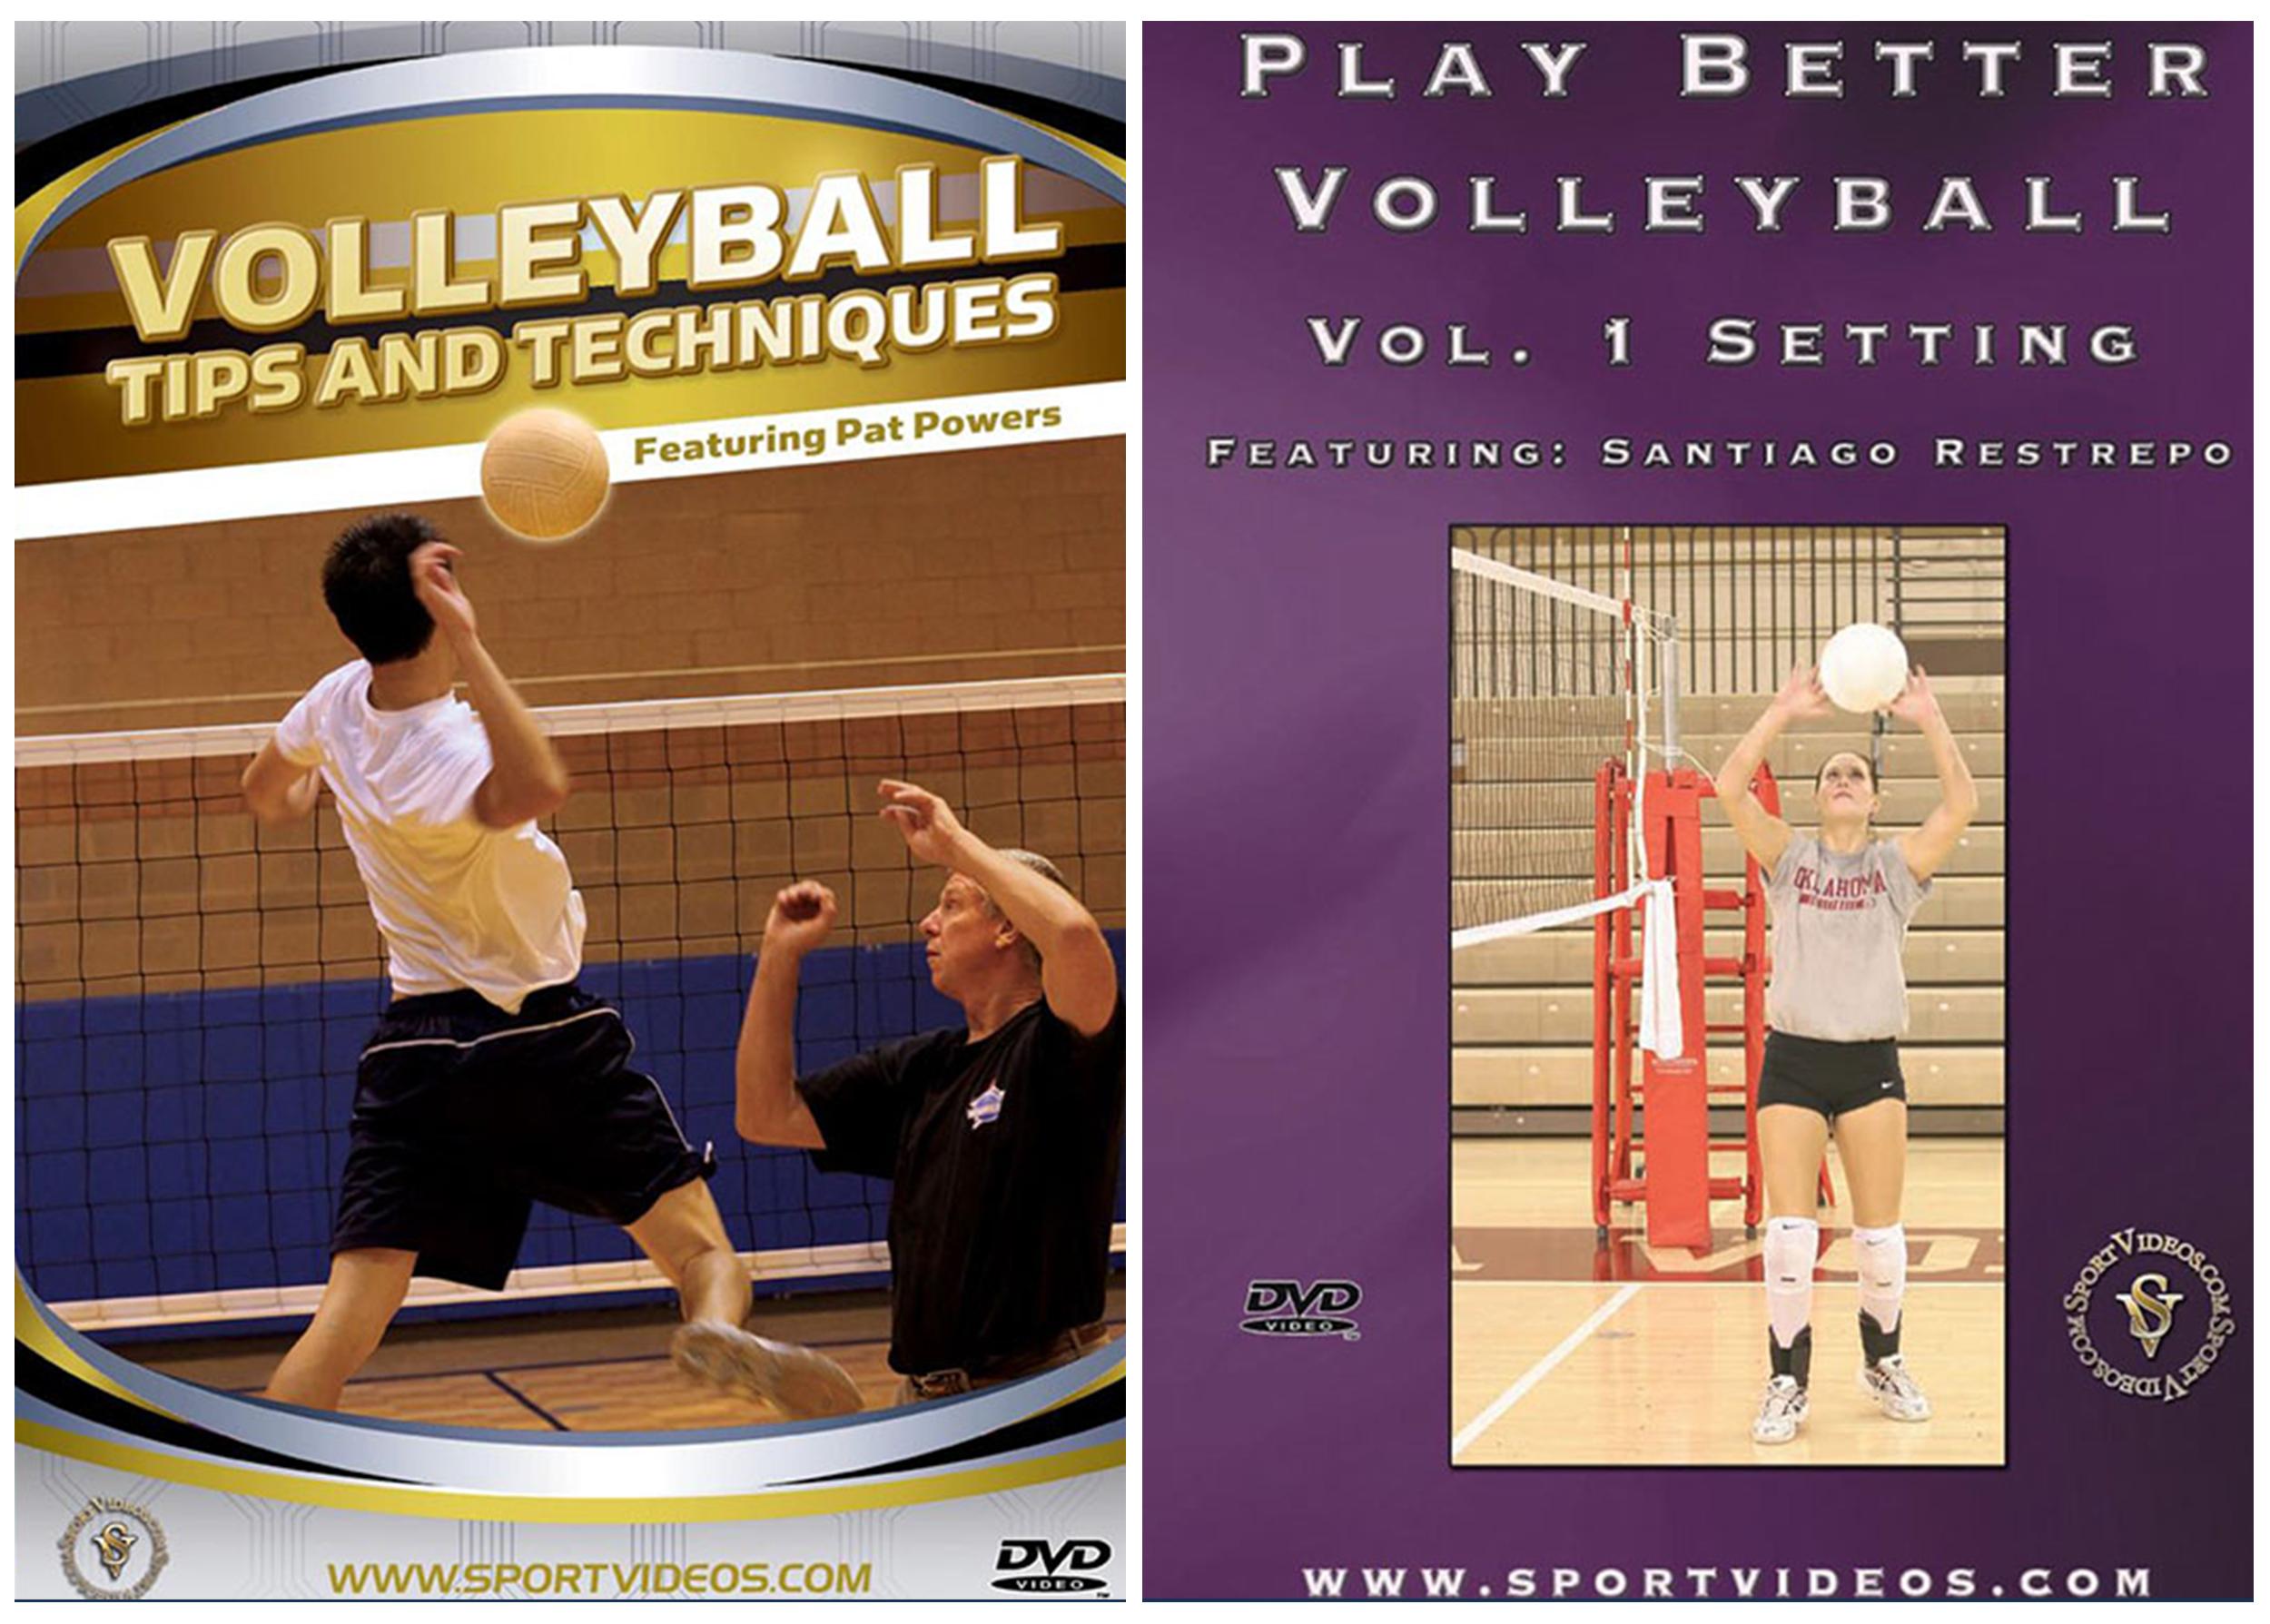 Volleyball 2 DVDs Set